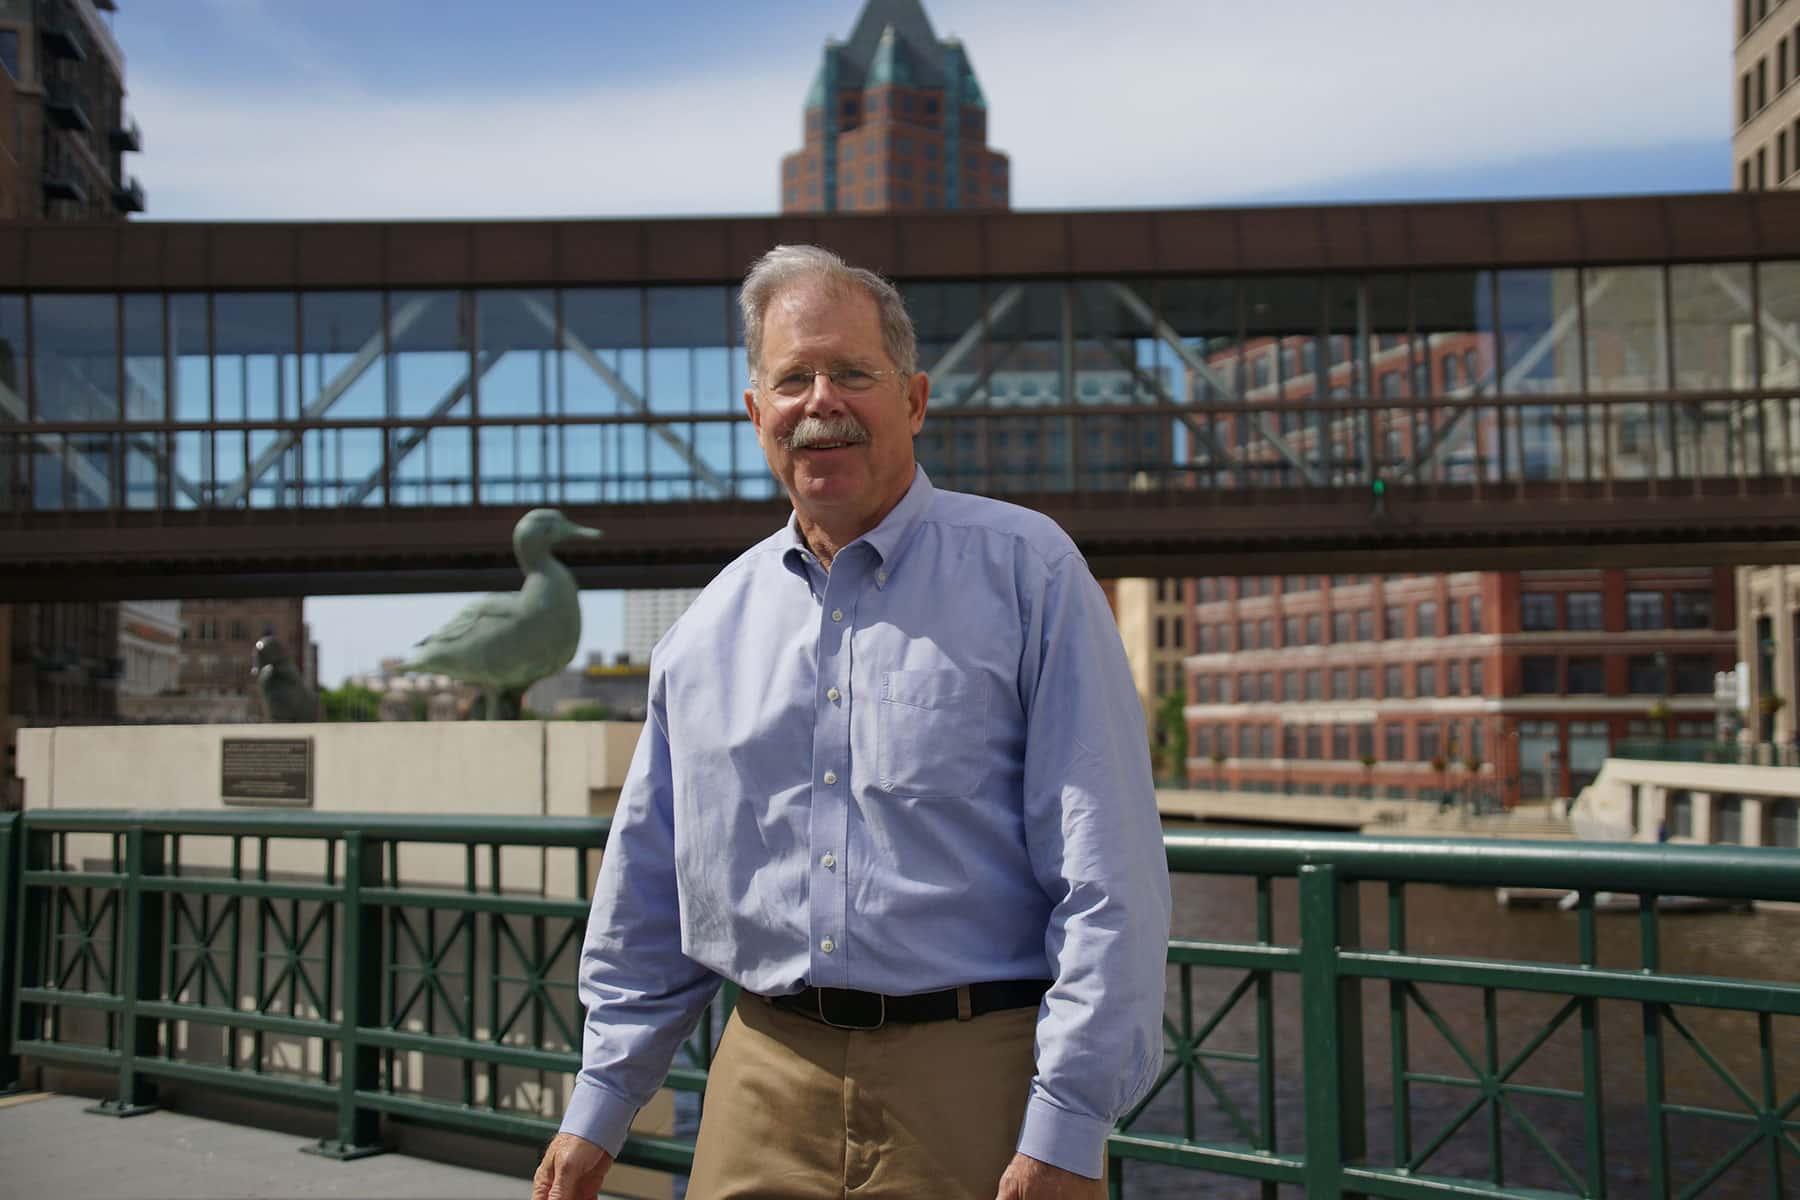 Photo Essay Filming On Active Bridges  The Milwaukee Independent Gurdawieye